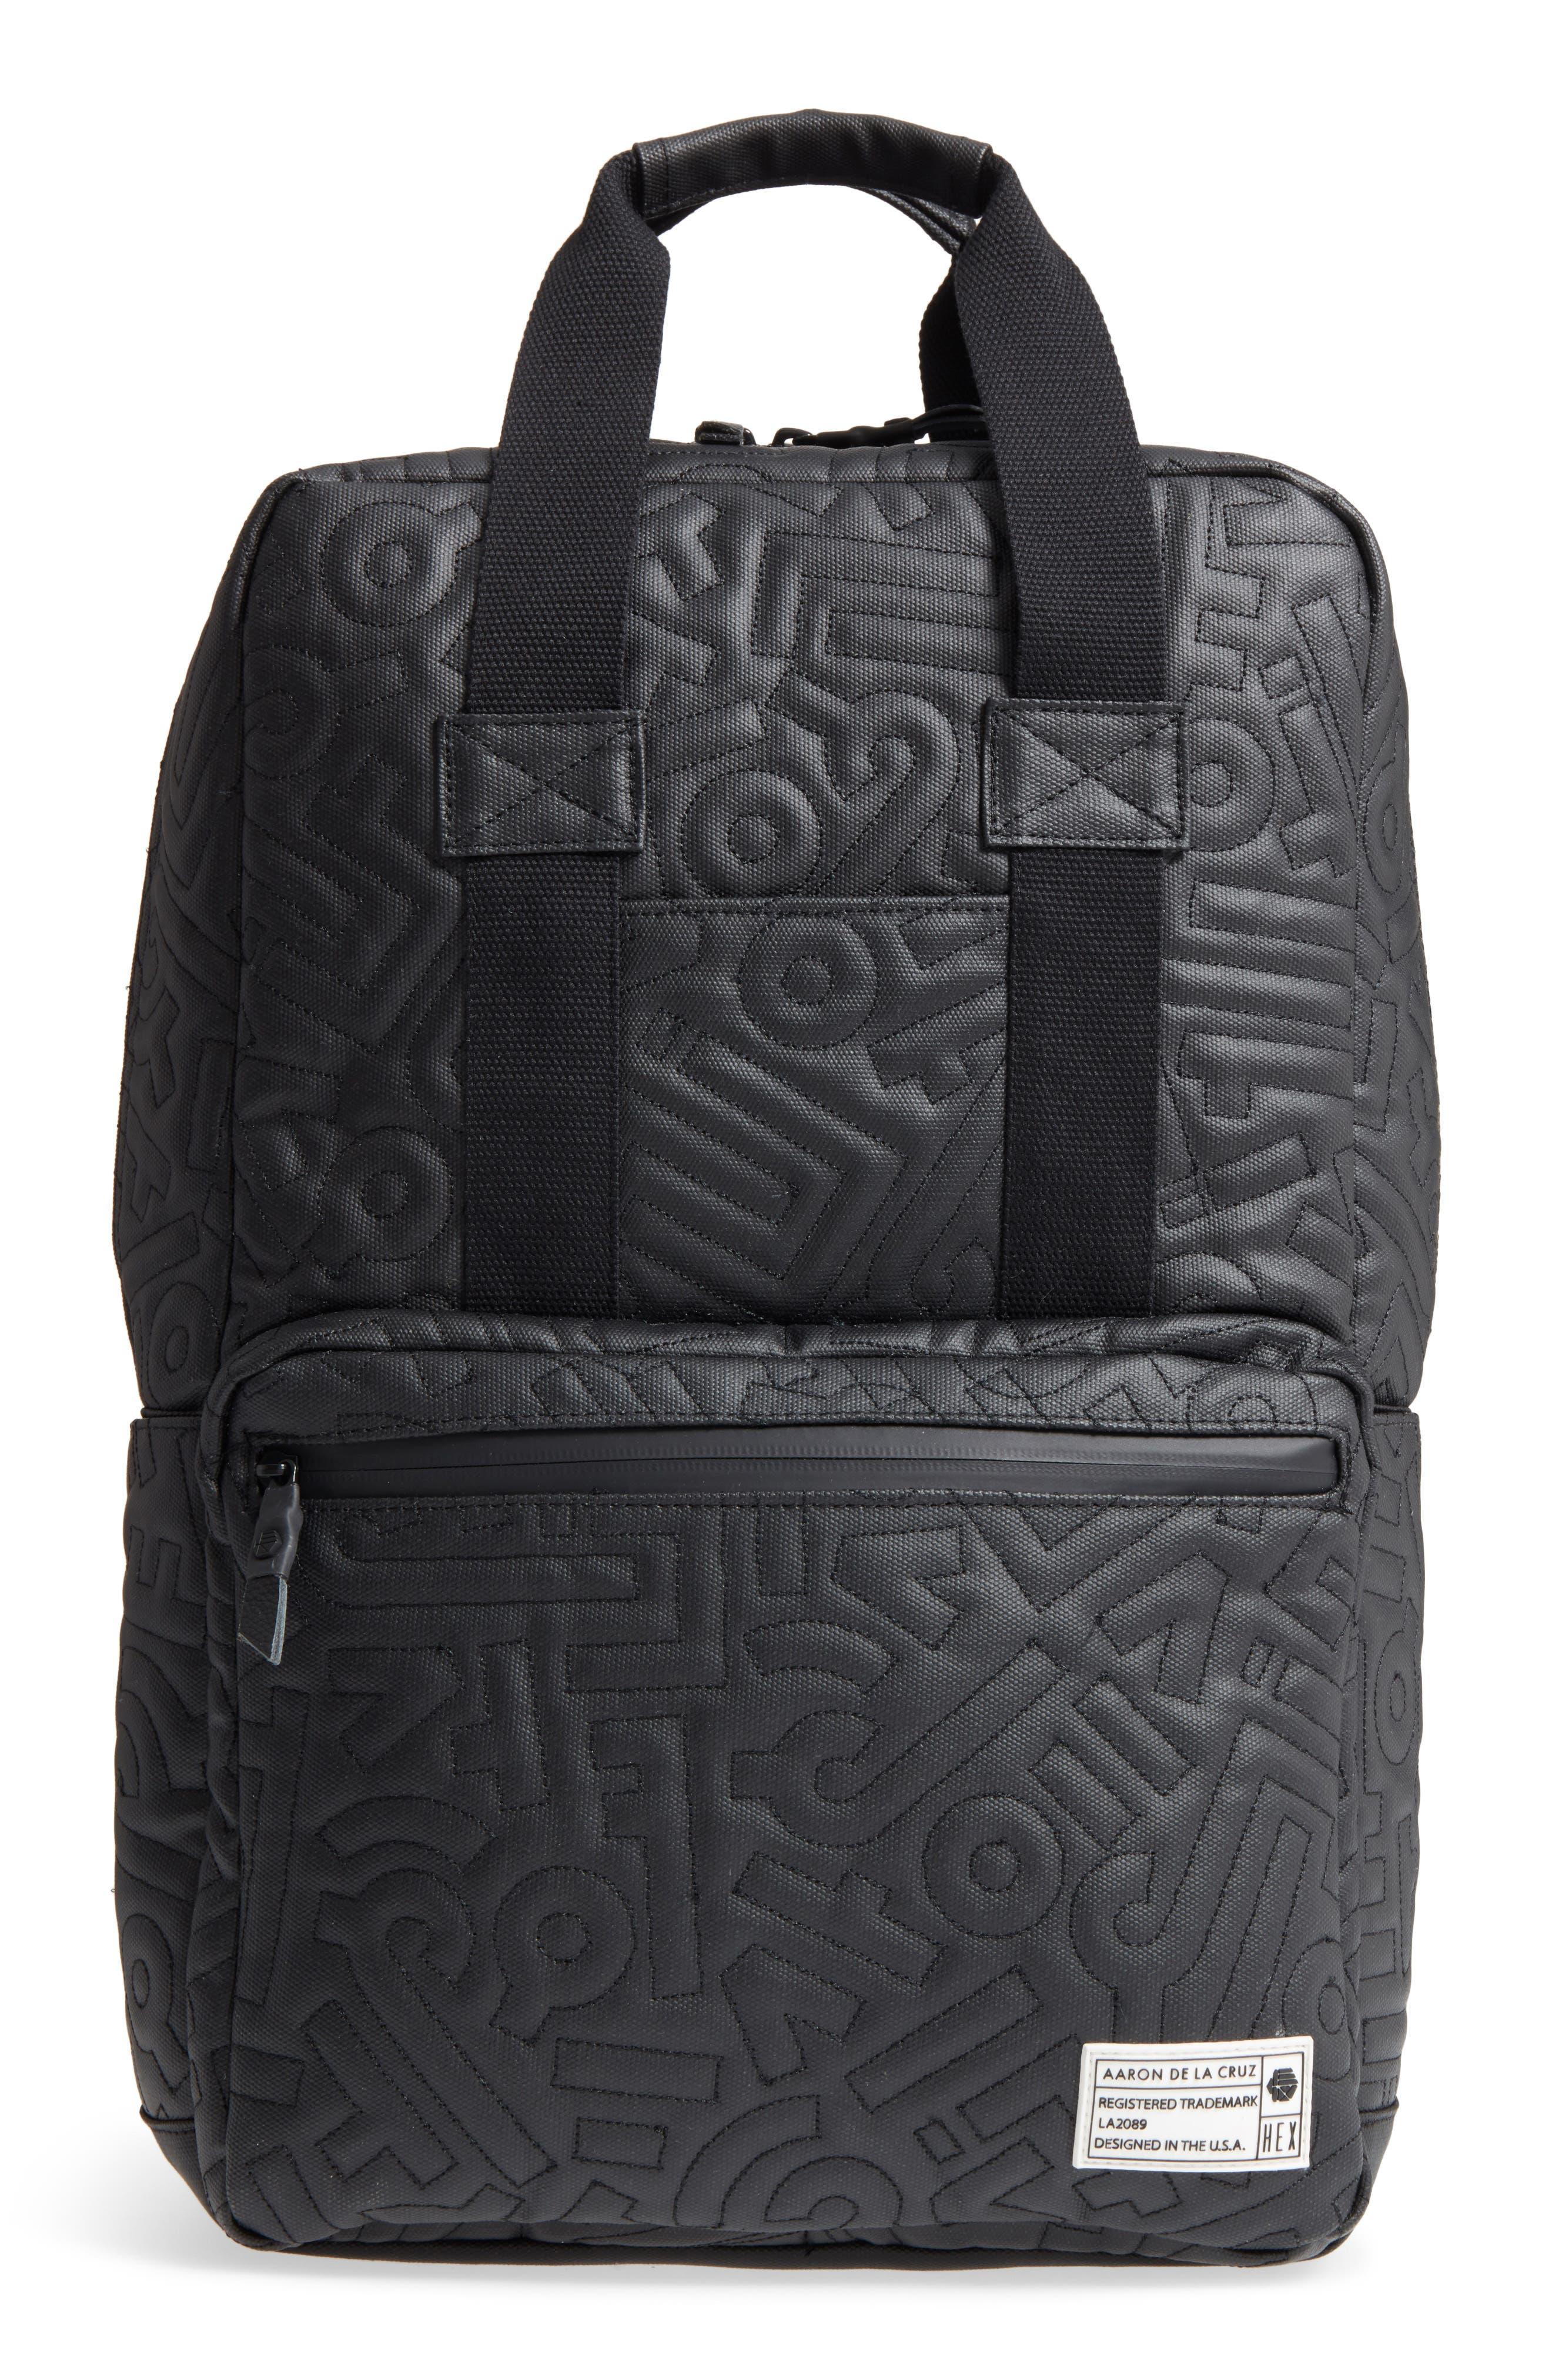 HEX x Aaron De La Cruz Convertible Backpack, Main, color, 003